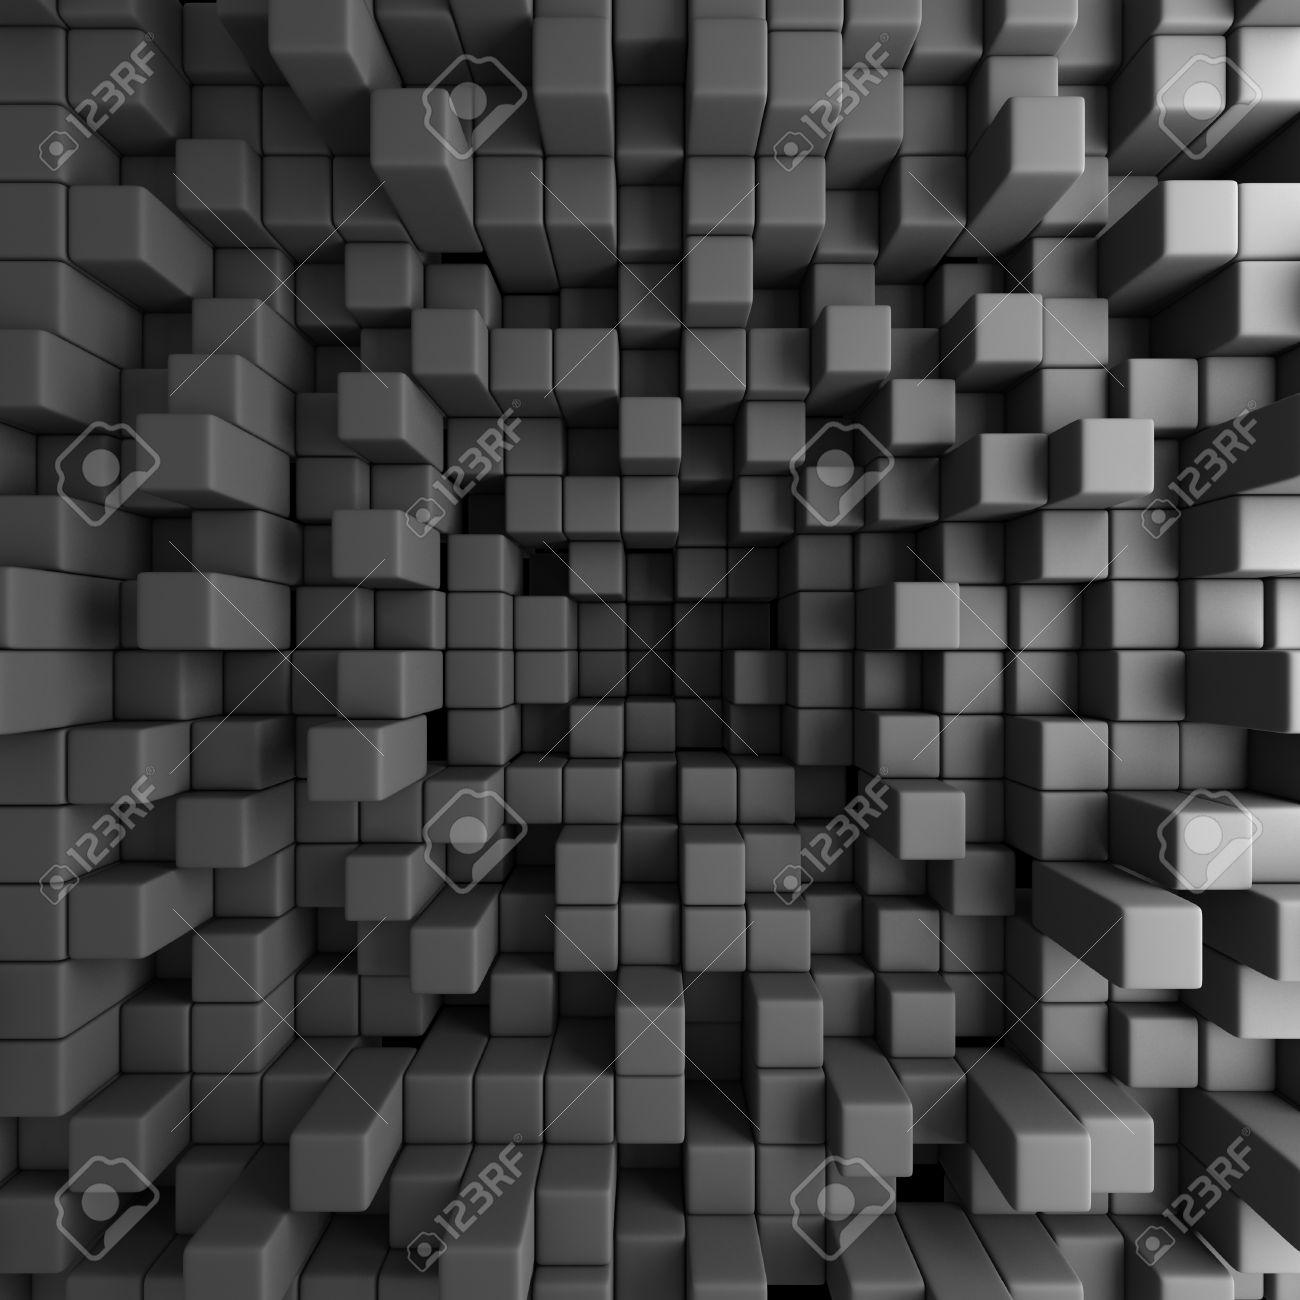 Abstract 3d Cubes Blocks Wallpaper Background 3d Render